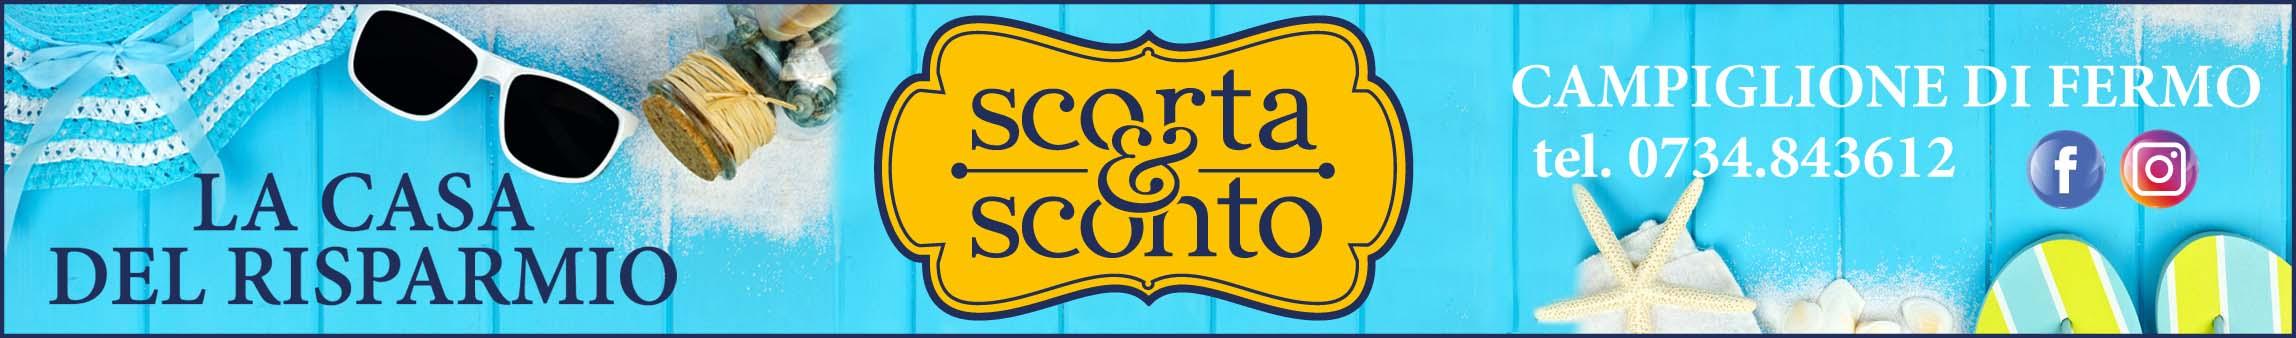 Scorta & Sconto